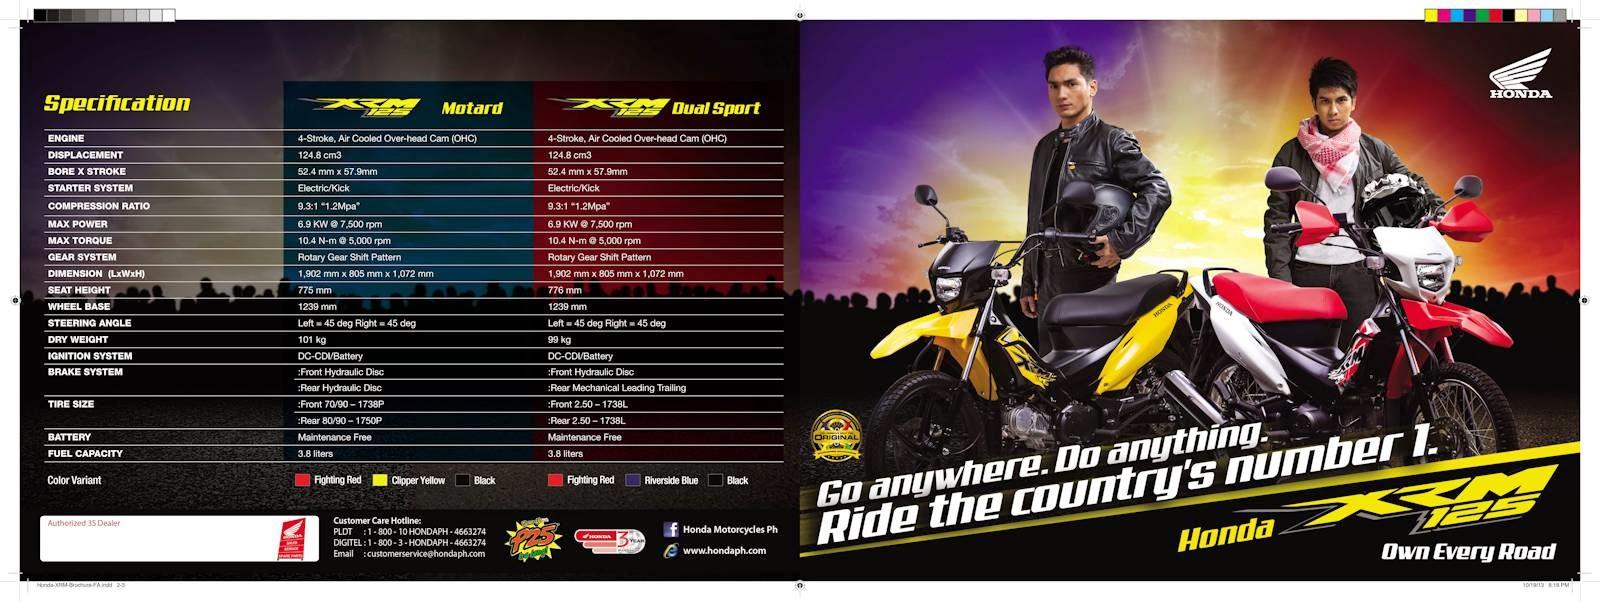 Honda Philippines Launches XRM 125 Motorcycle (w/ Brochure ... for Honda Motorcycle Xrm 125 Price List  153tgx